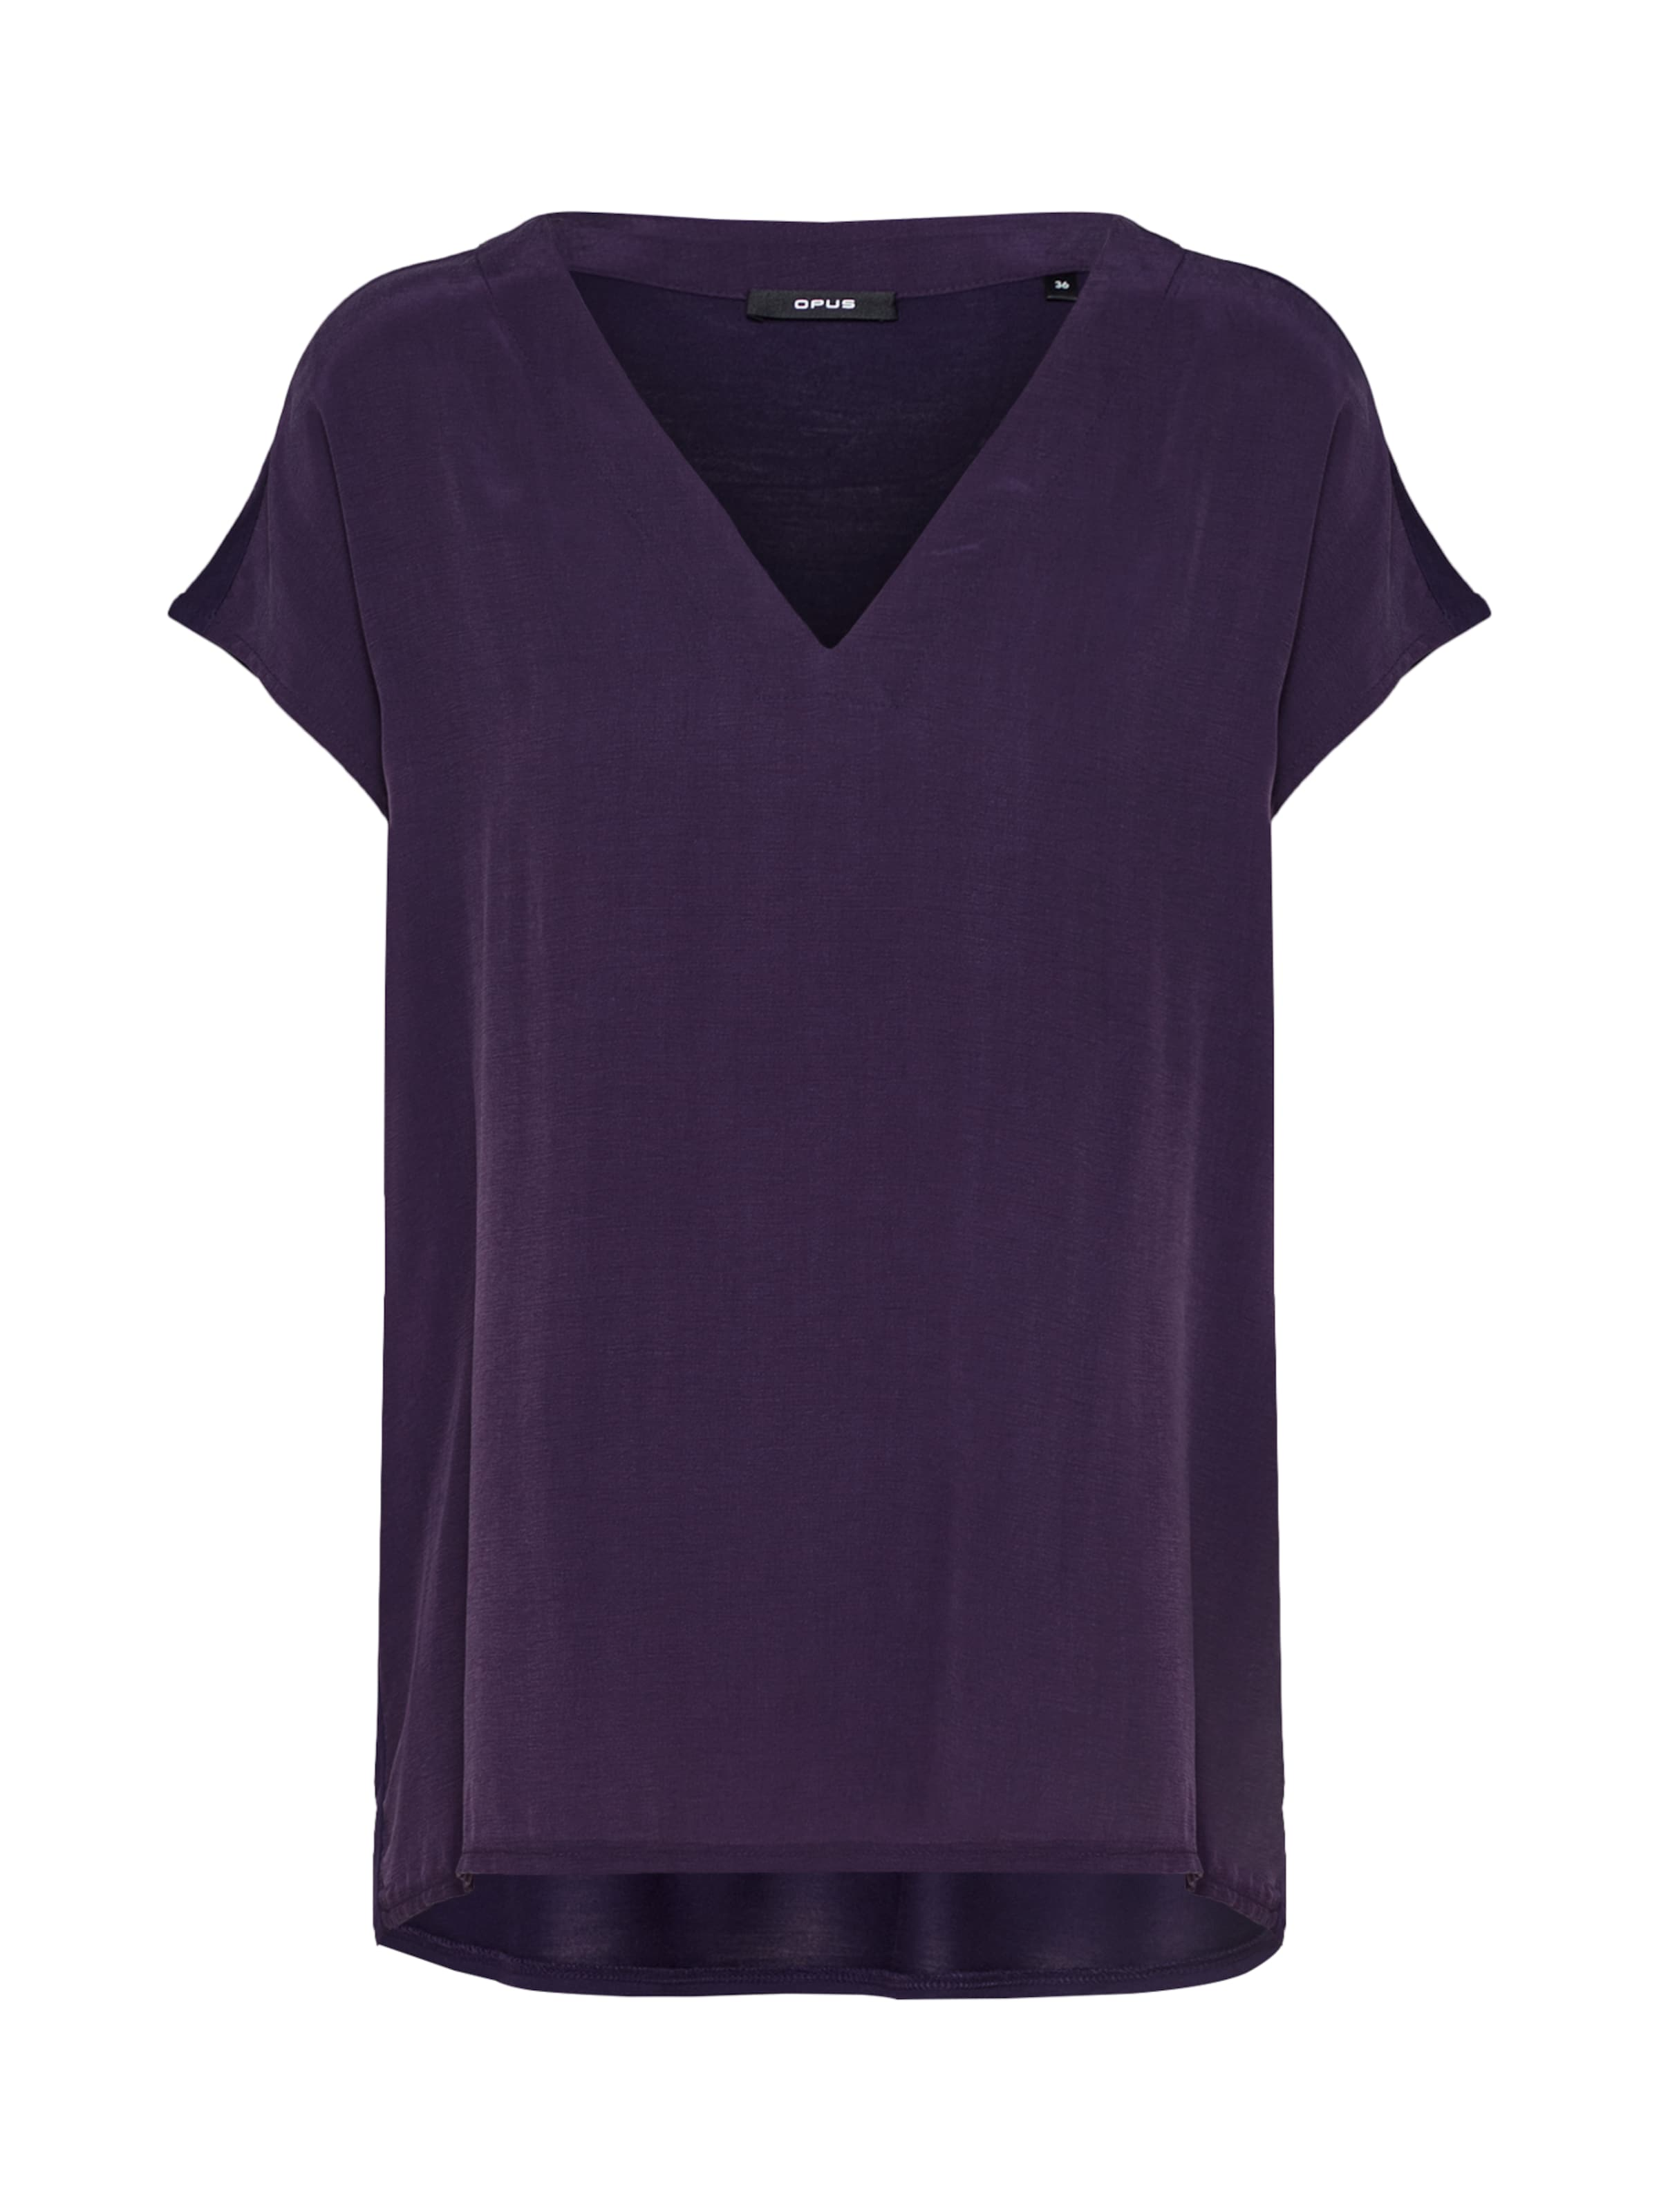 Shirt 'silvia' Dunkellila Opus Opus In Opus Dunkellila 'silvia' Shirt In 8wOZkN0PnX